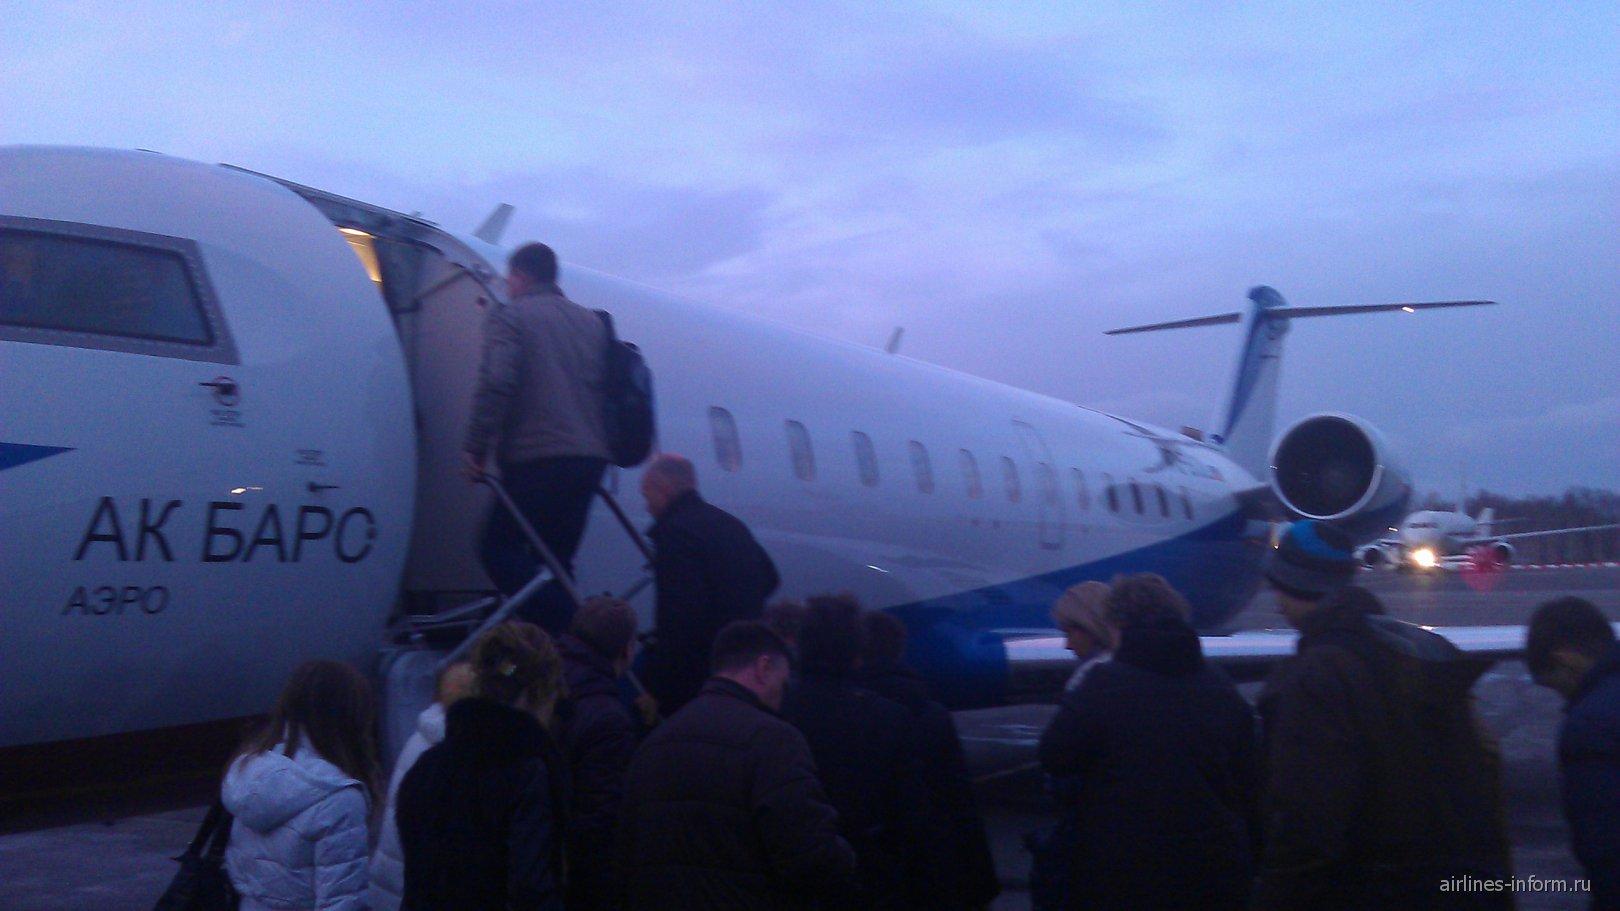 Посадка на рейс Петербург-Казань авиакомпании Ак Барс Аэро